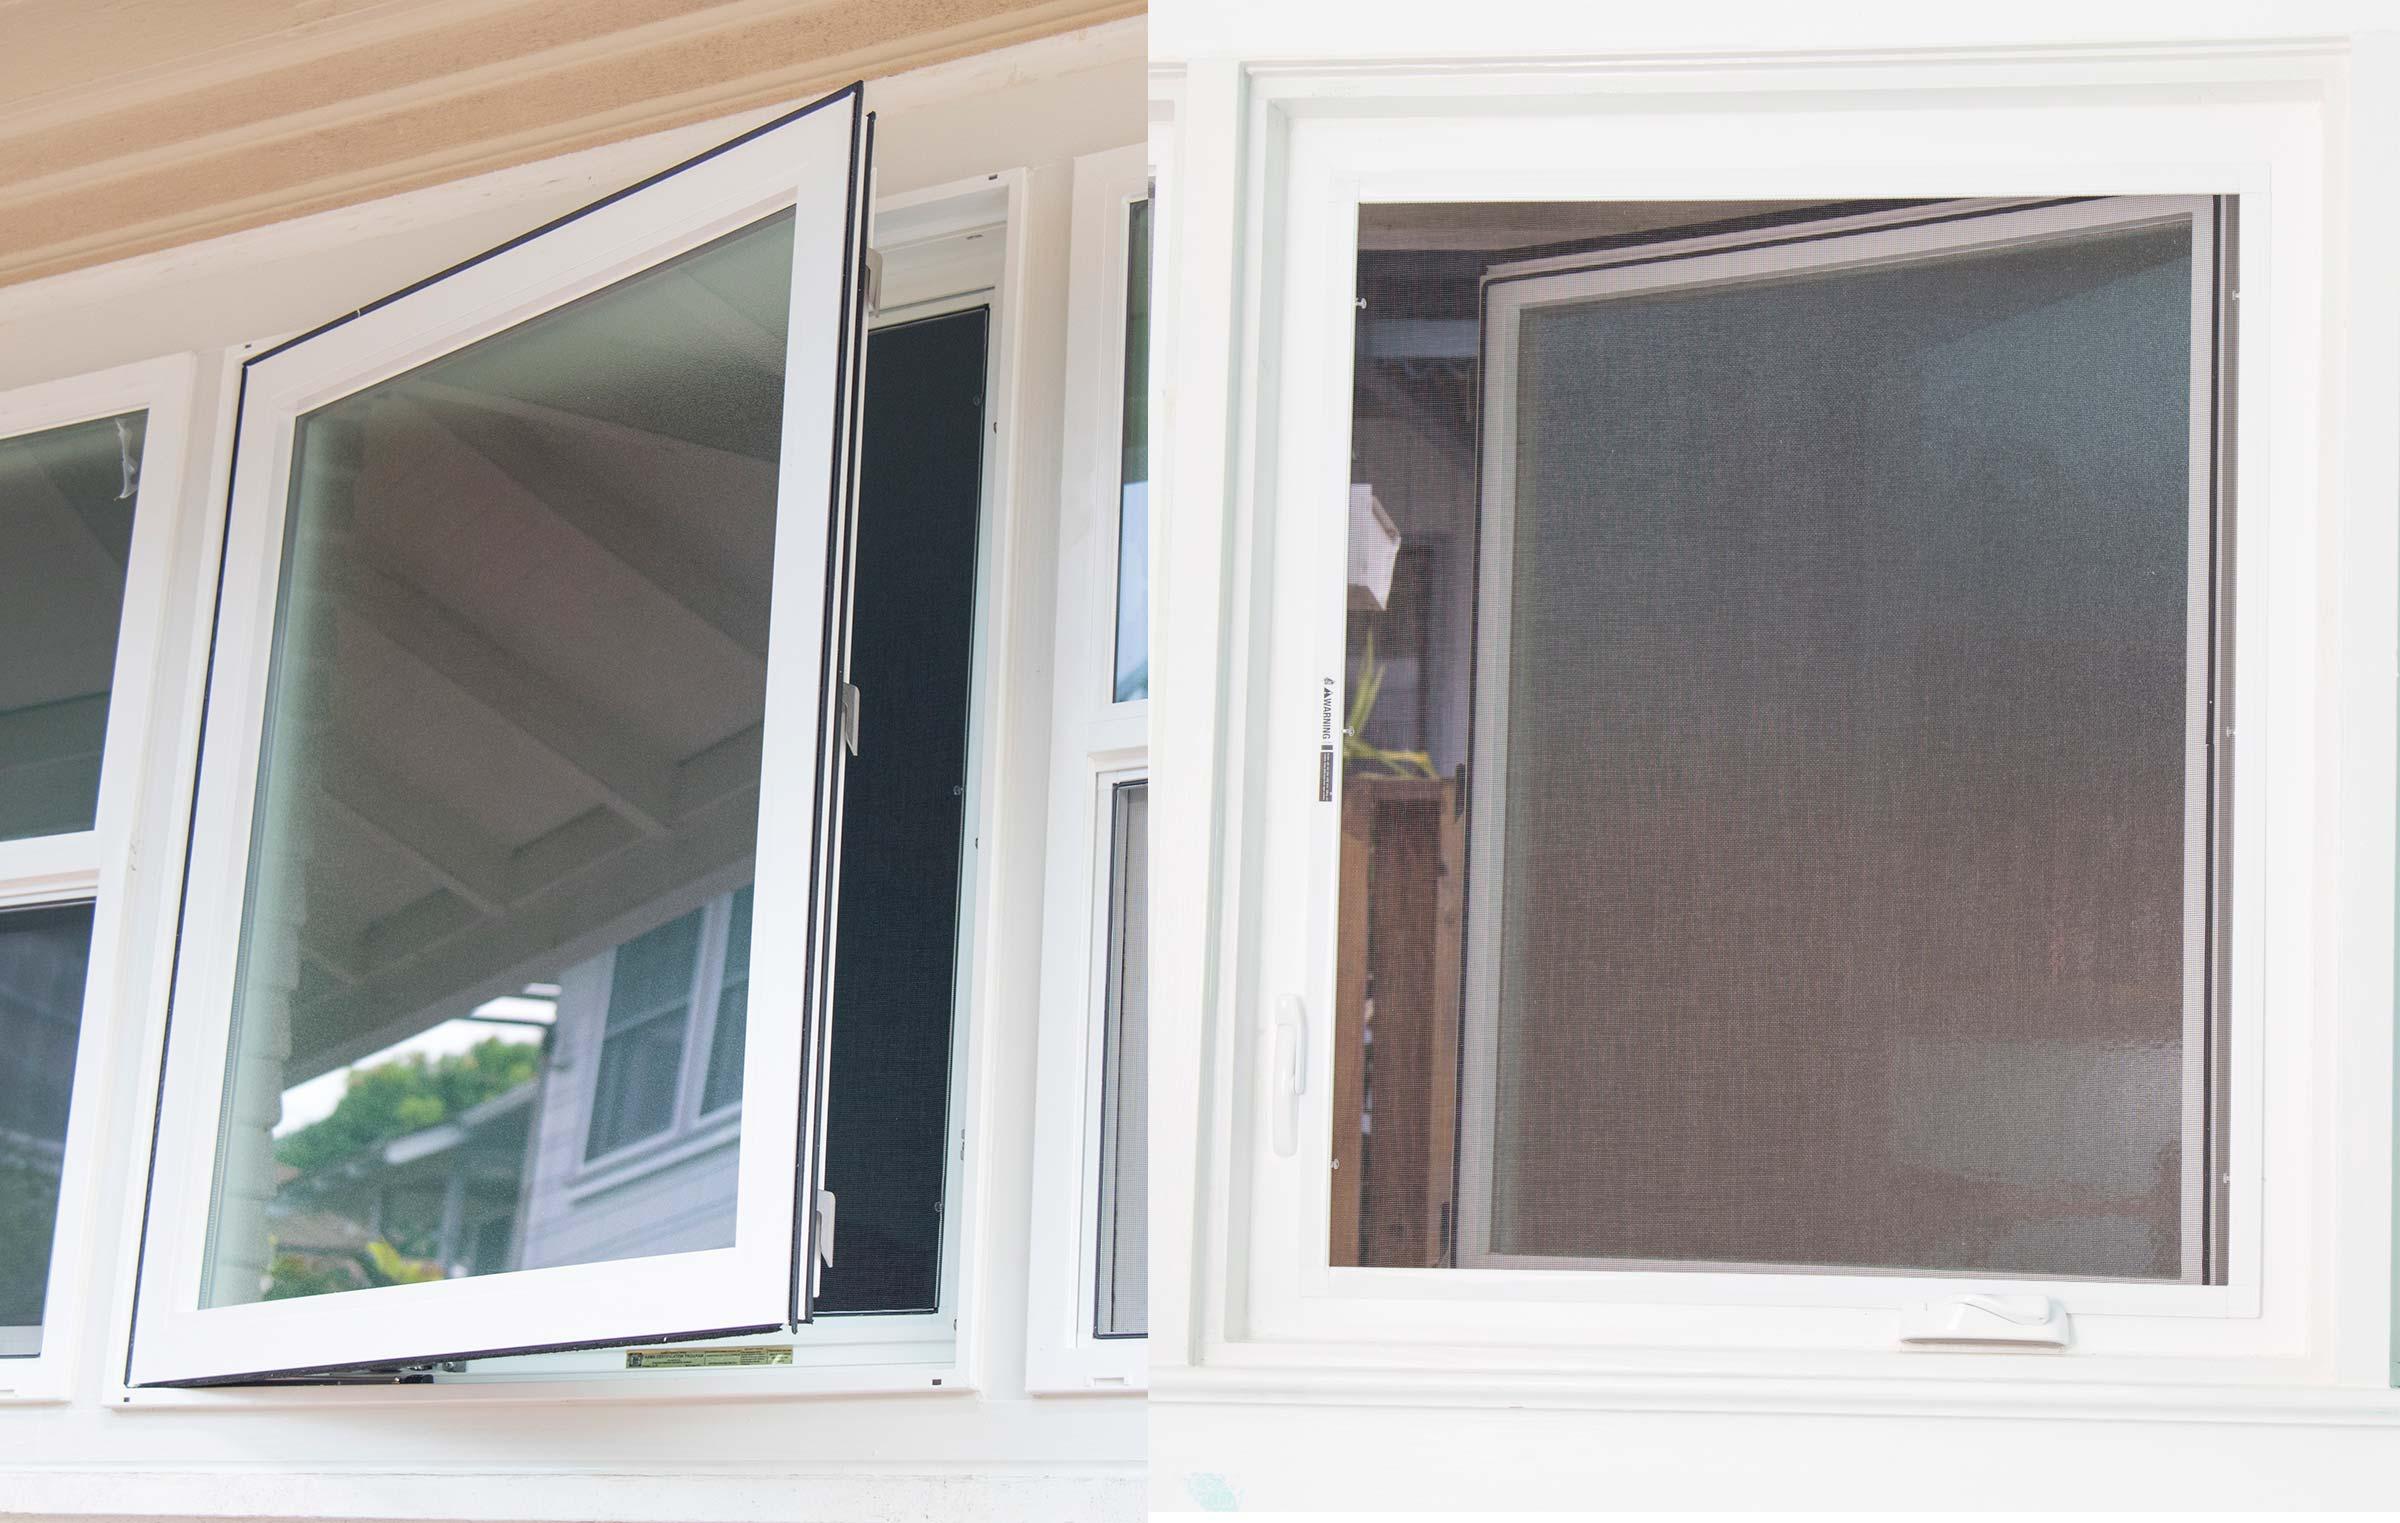 Vinyl Casement Windows from Island Windows and Doors